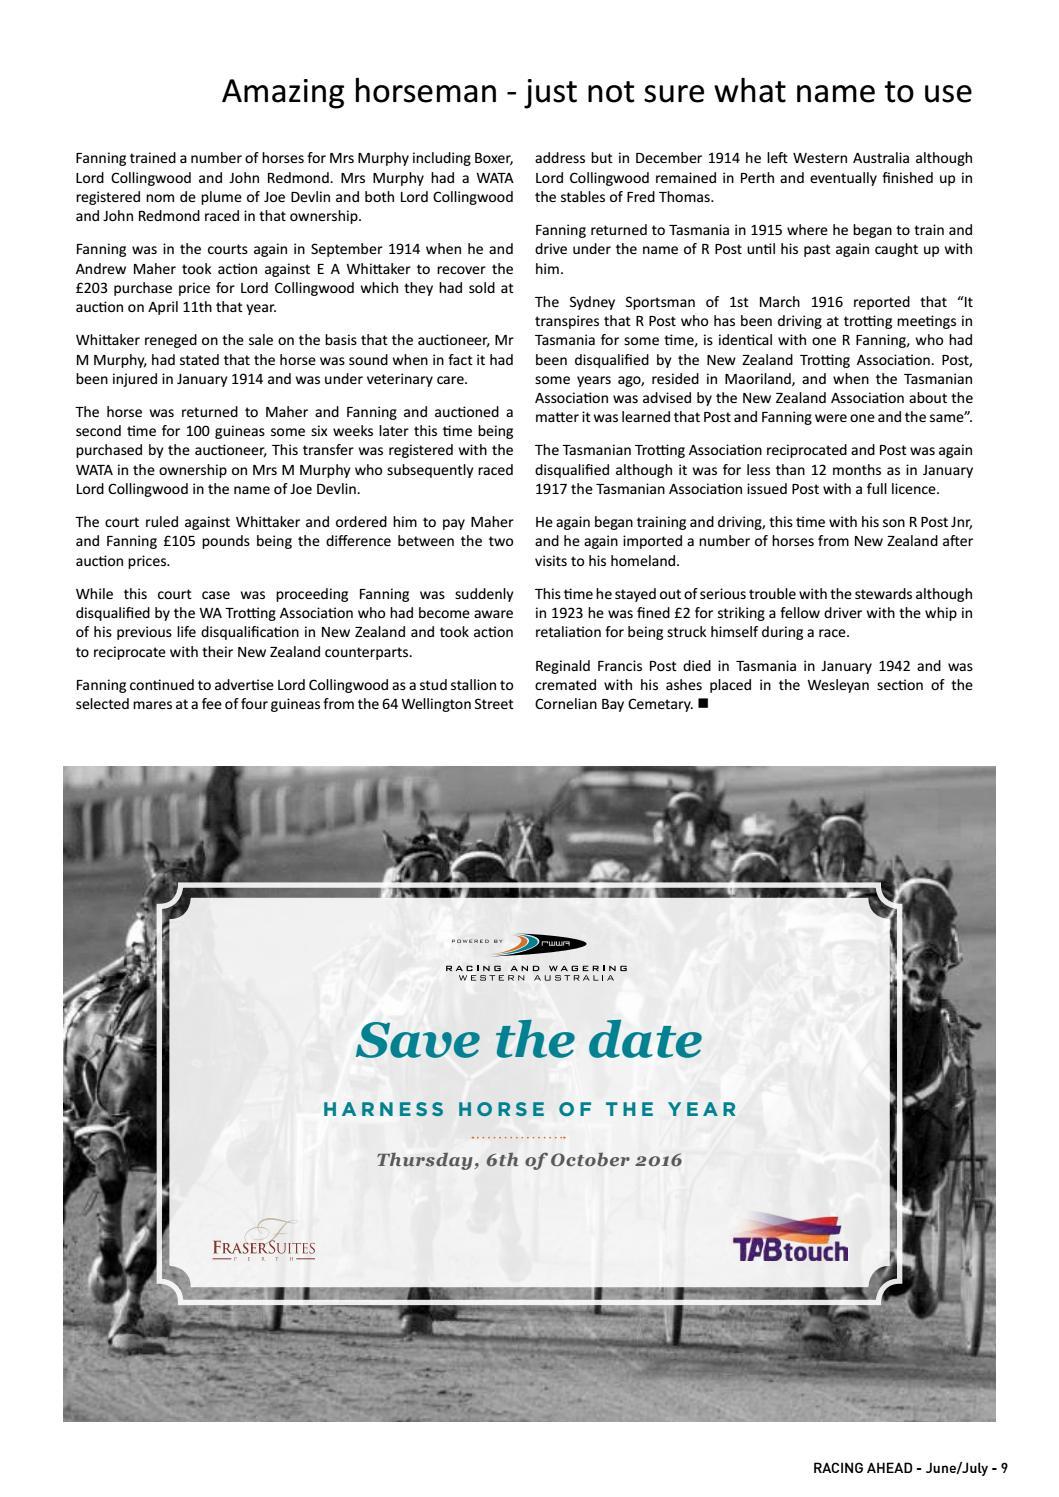 Racing Ahead WA - June/July 2016 by RWWA - issuu